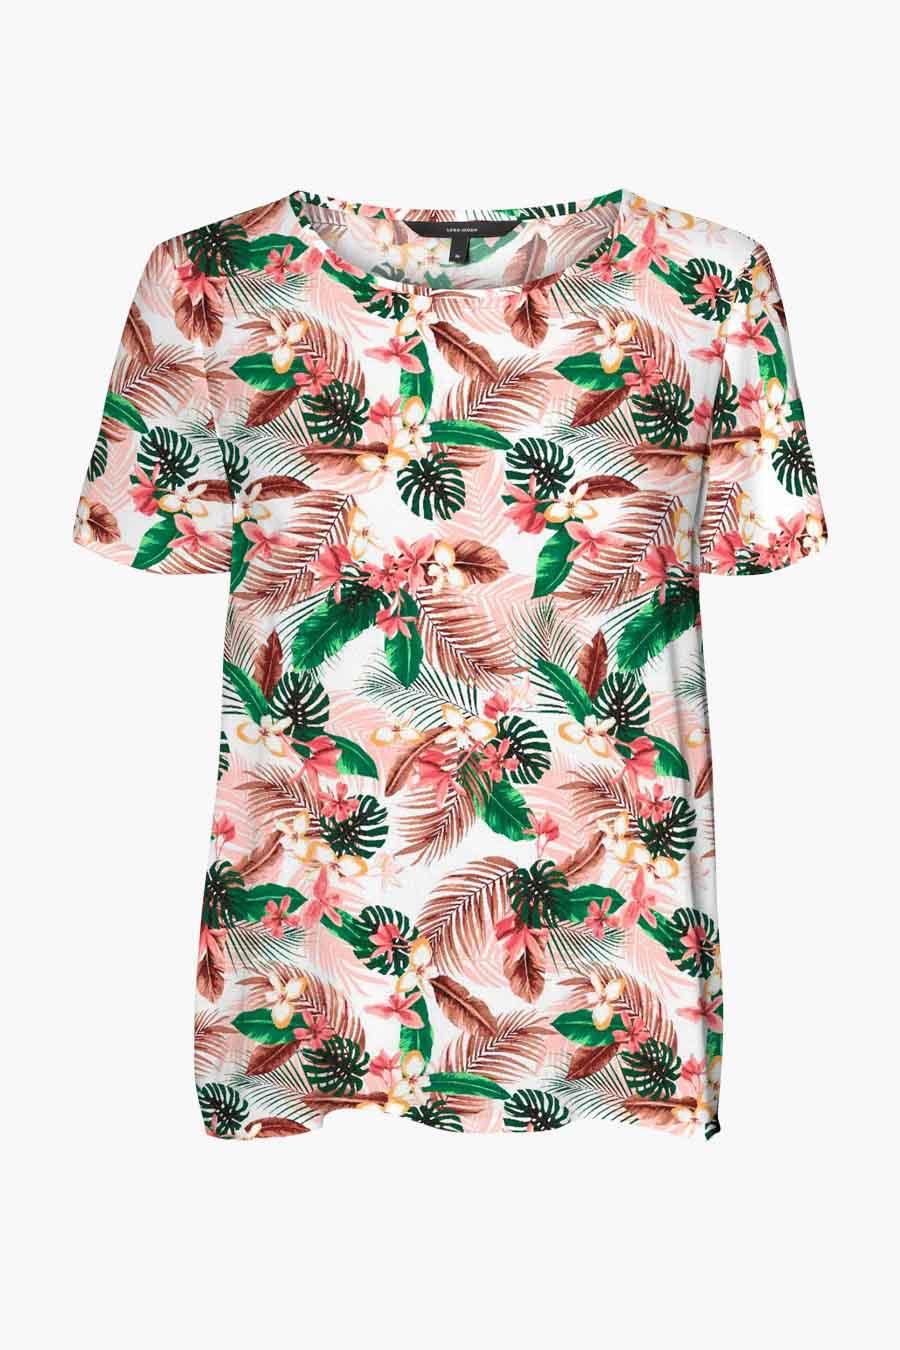 Vero Moda® Blouse korte mouwen, Roze, Dames, Maat: XS